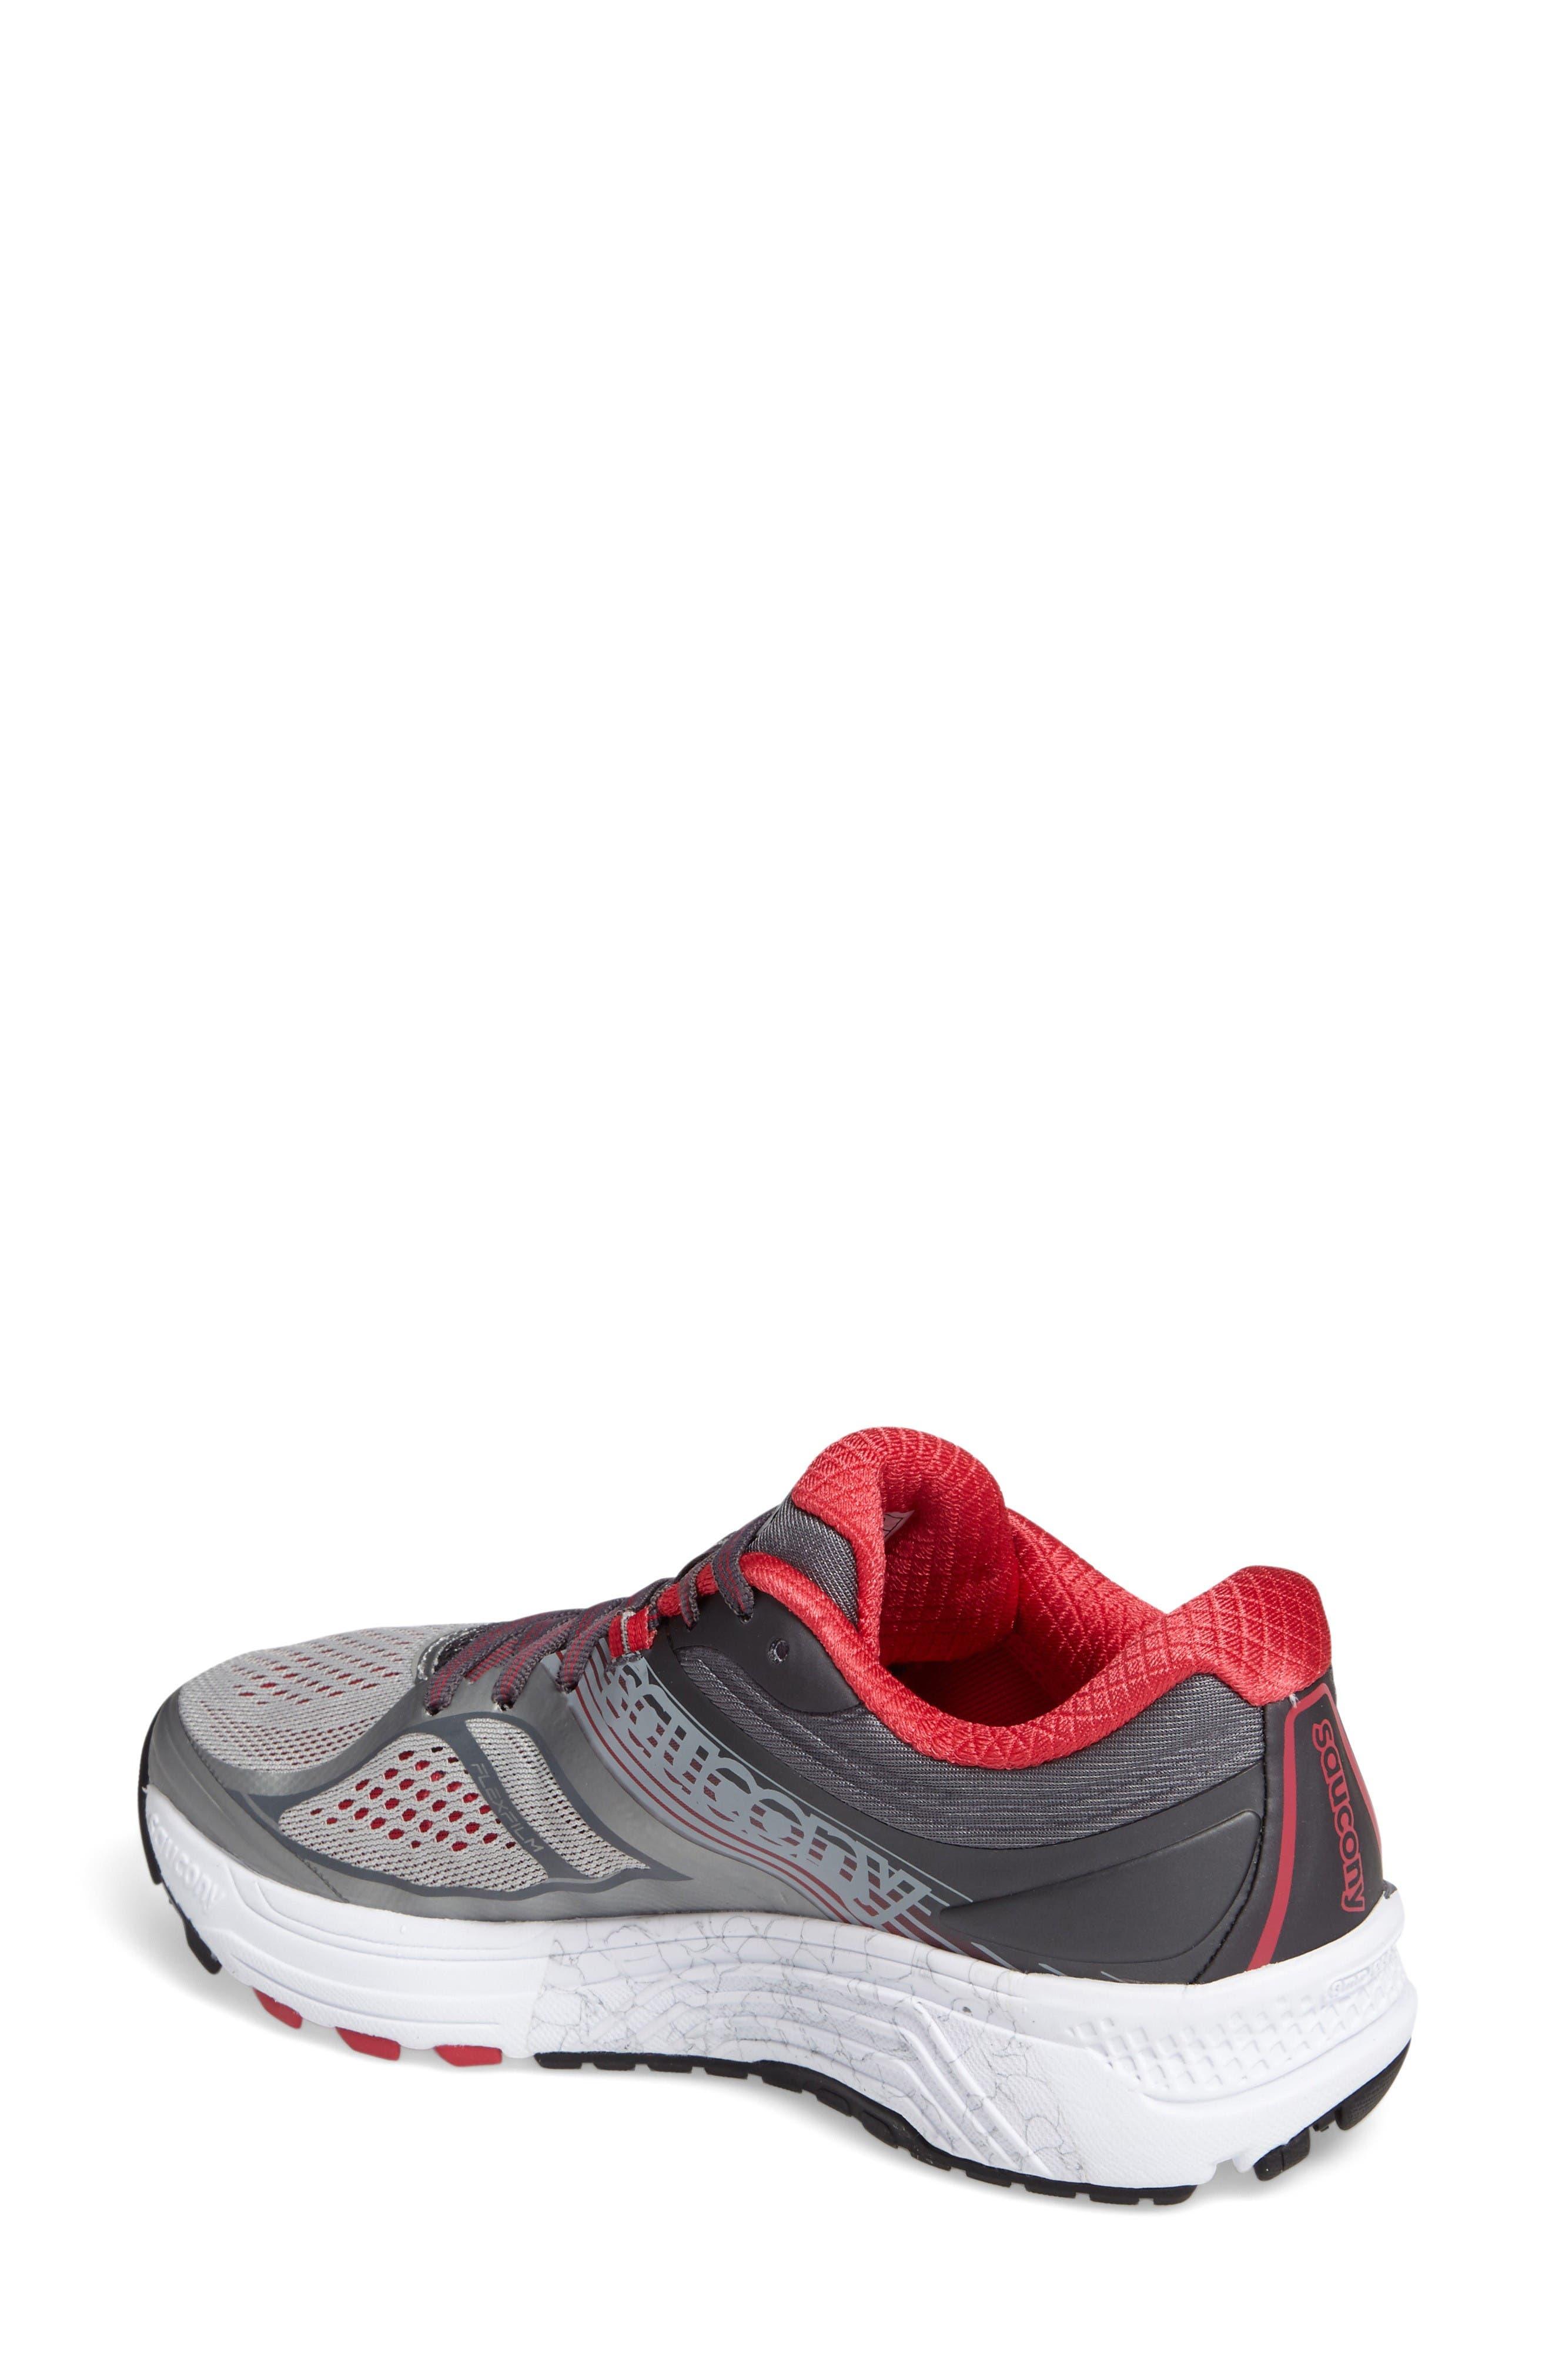 Alternate Image 2  - Saucony Guide 10 Running Shoe (Women)